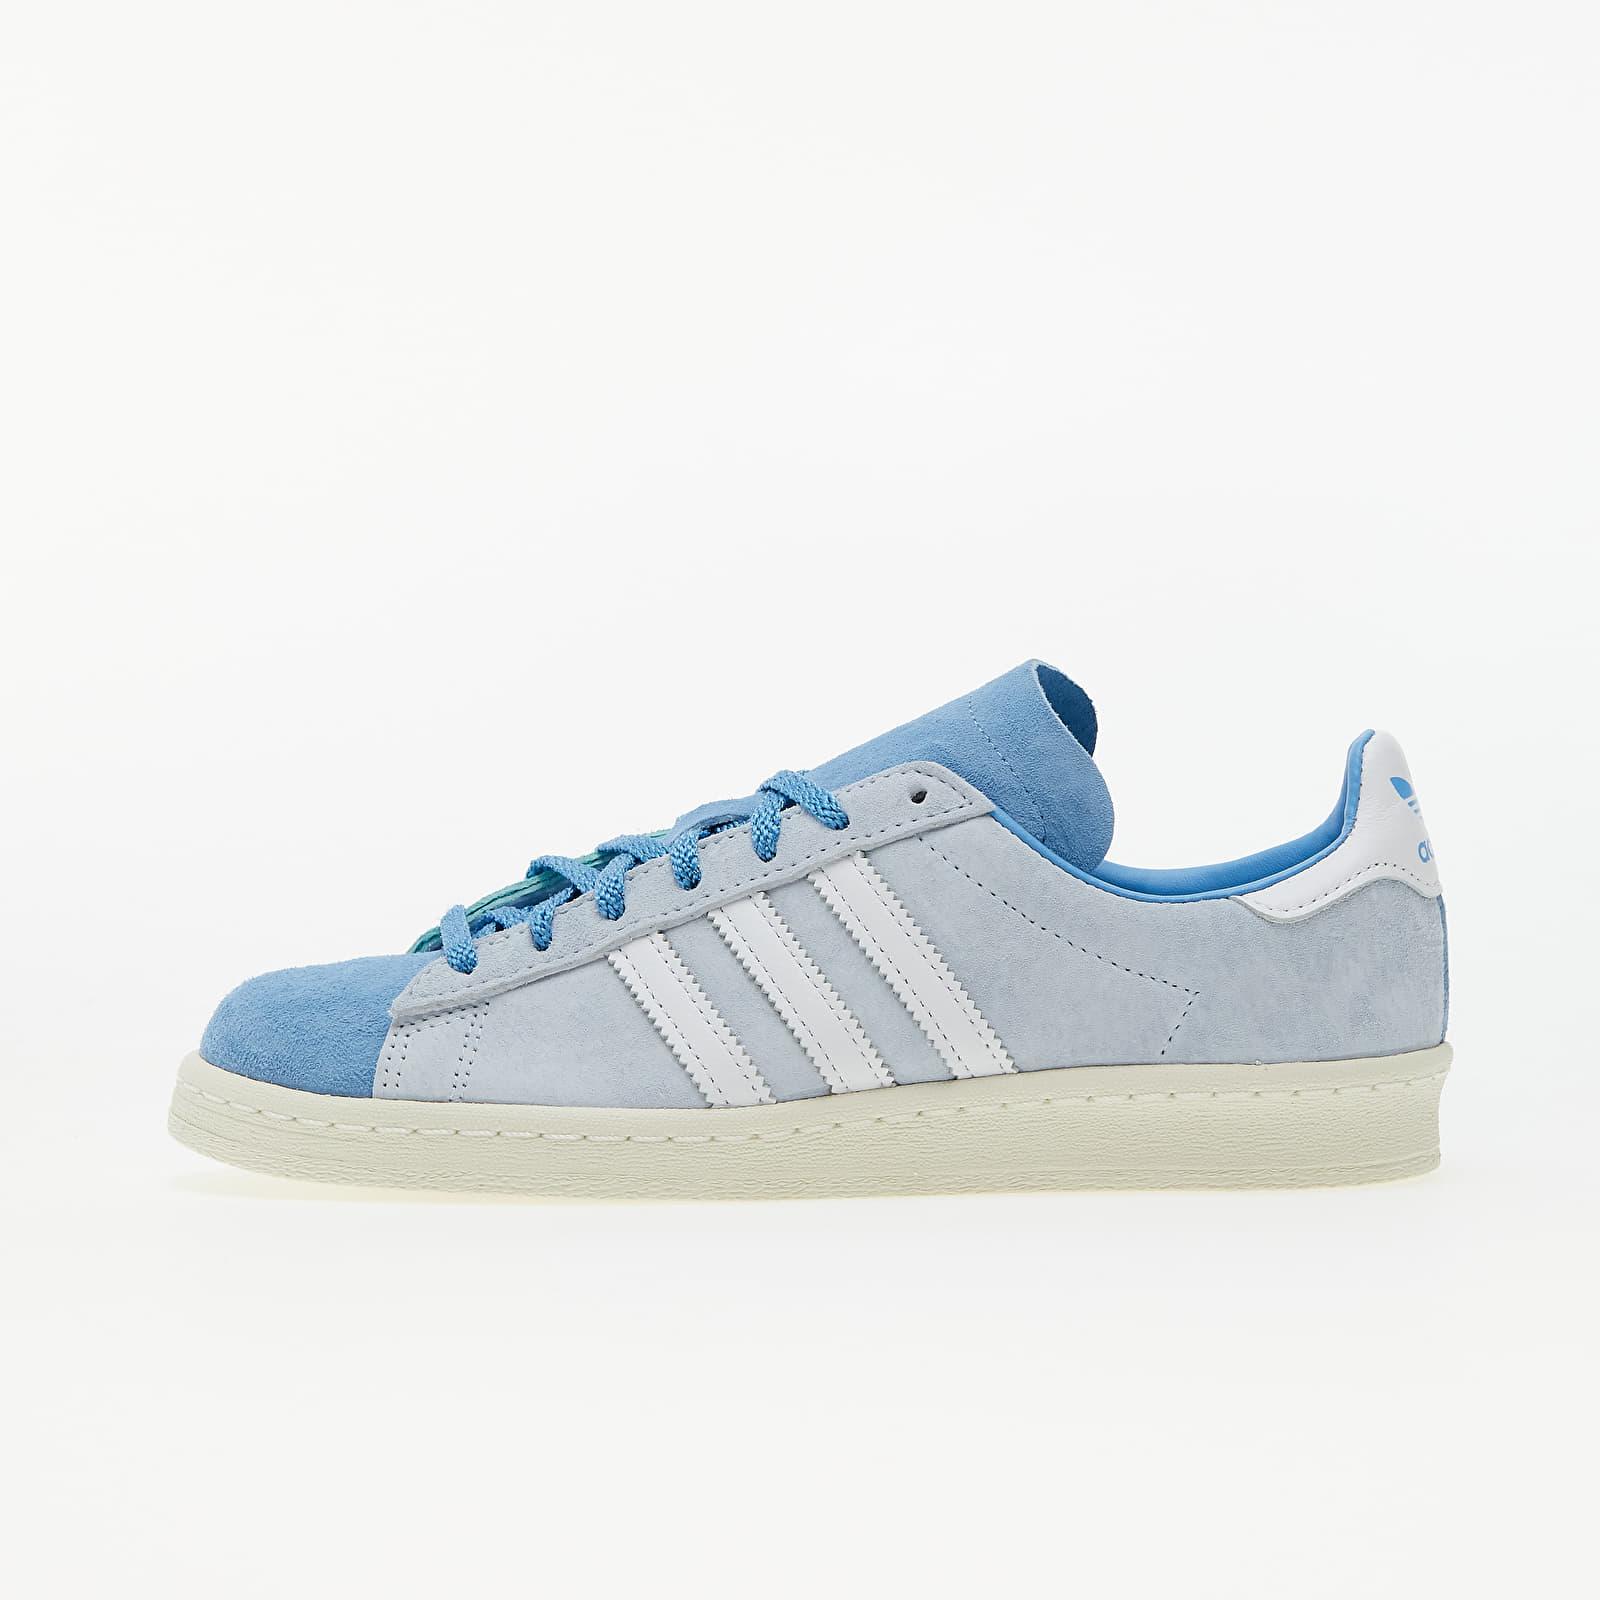 adidas Campus 80s W Halo Blue/ Ftw White/ Haze Blue EUR 41 1/3